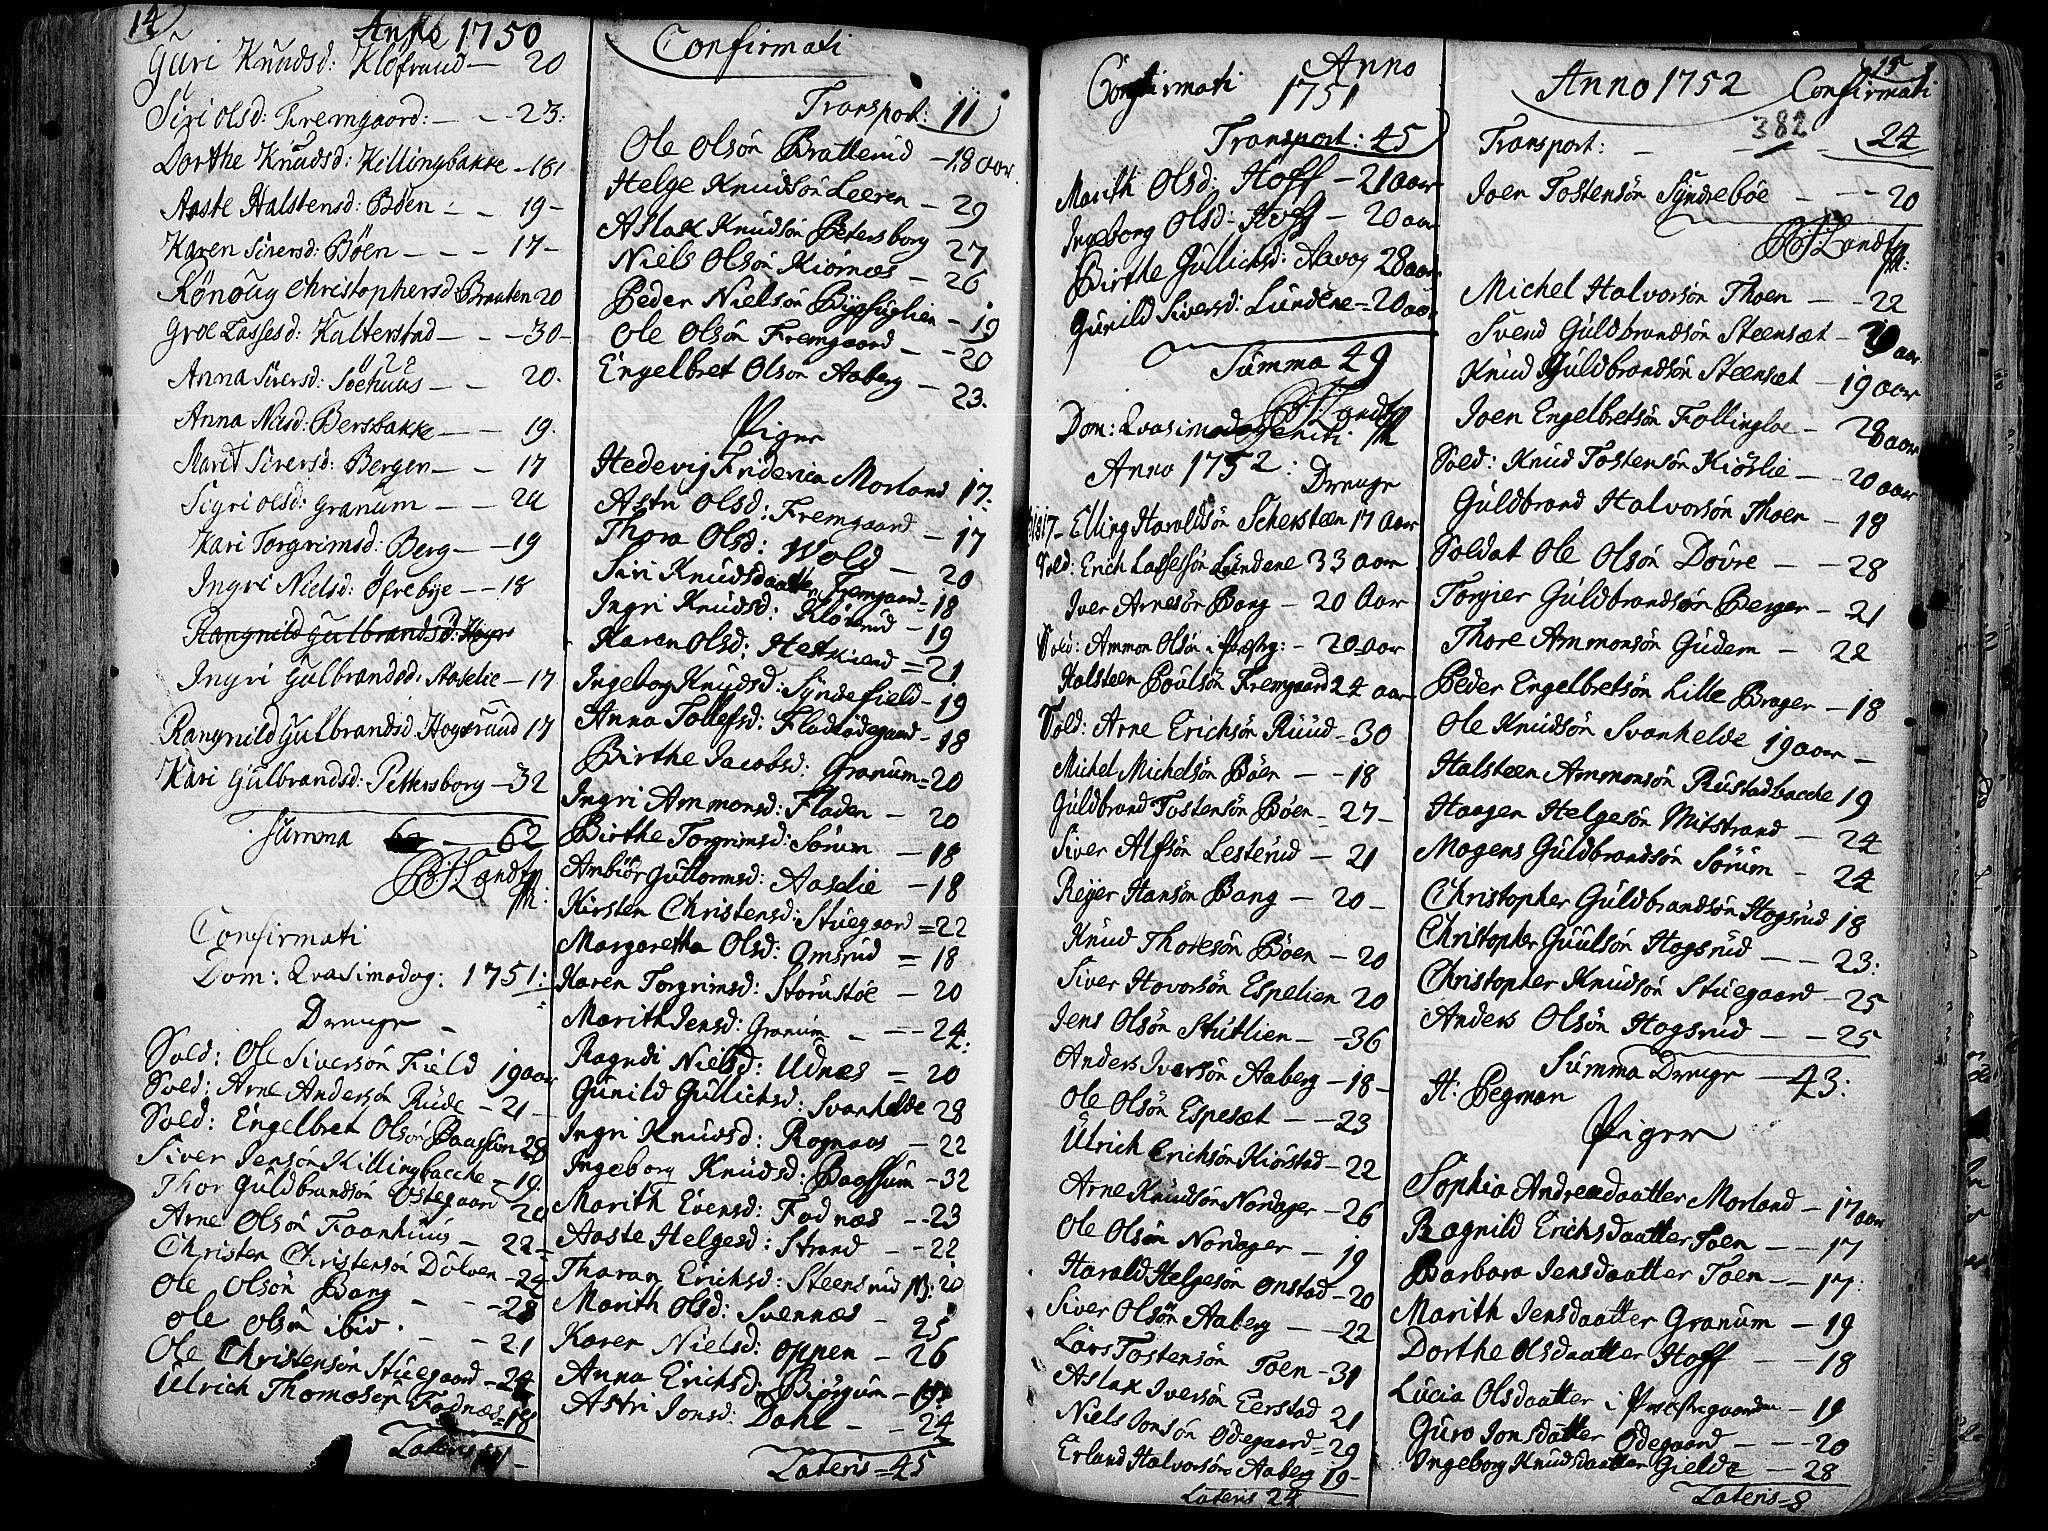 SAH, Aurdal prestekontor, Ministerialbok nr. 4, 1730-1762, s. 14-15